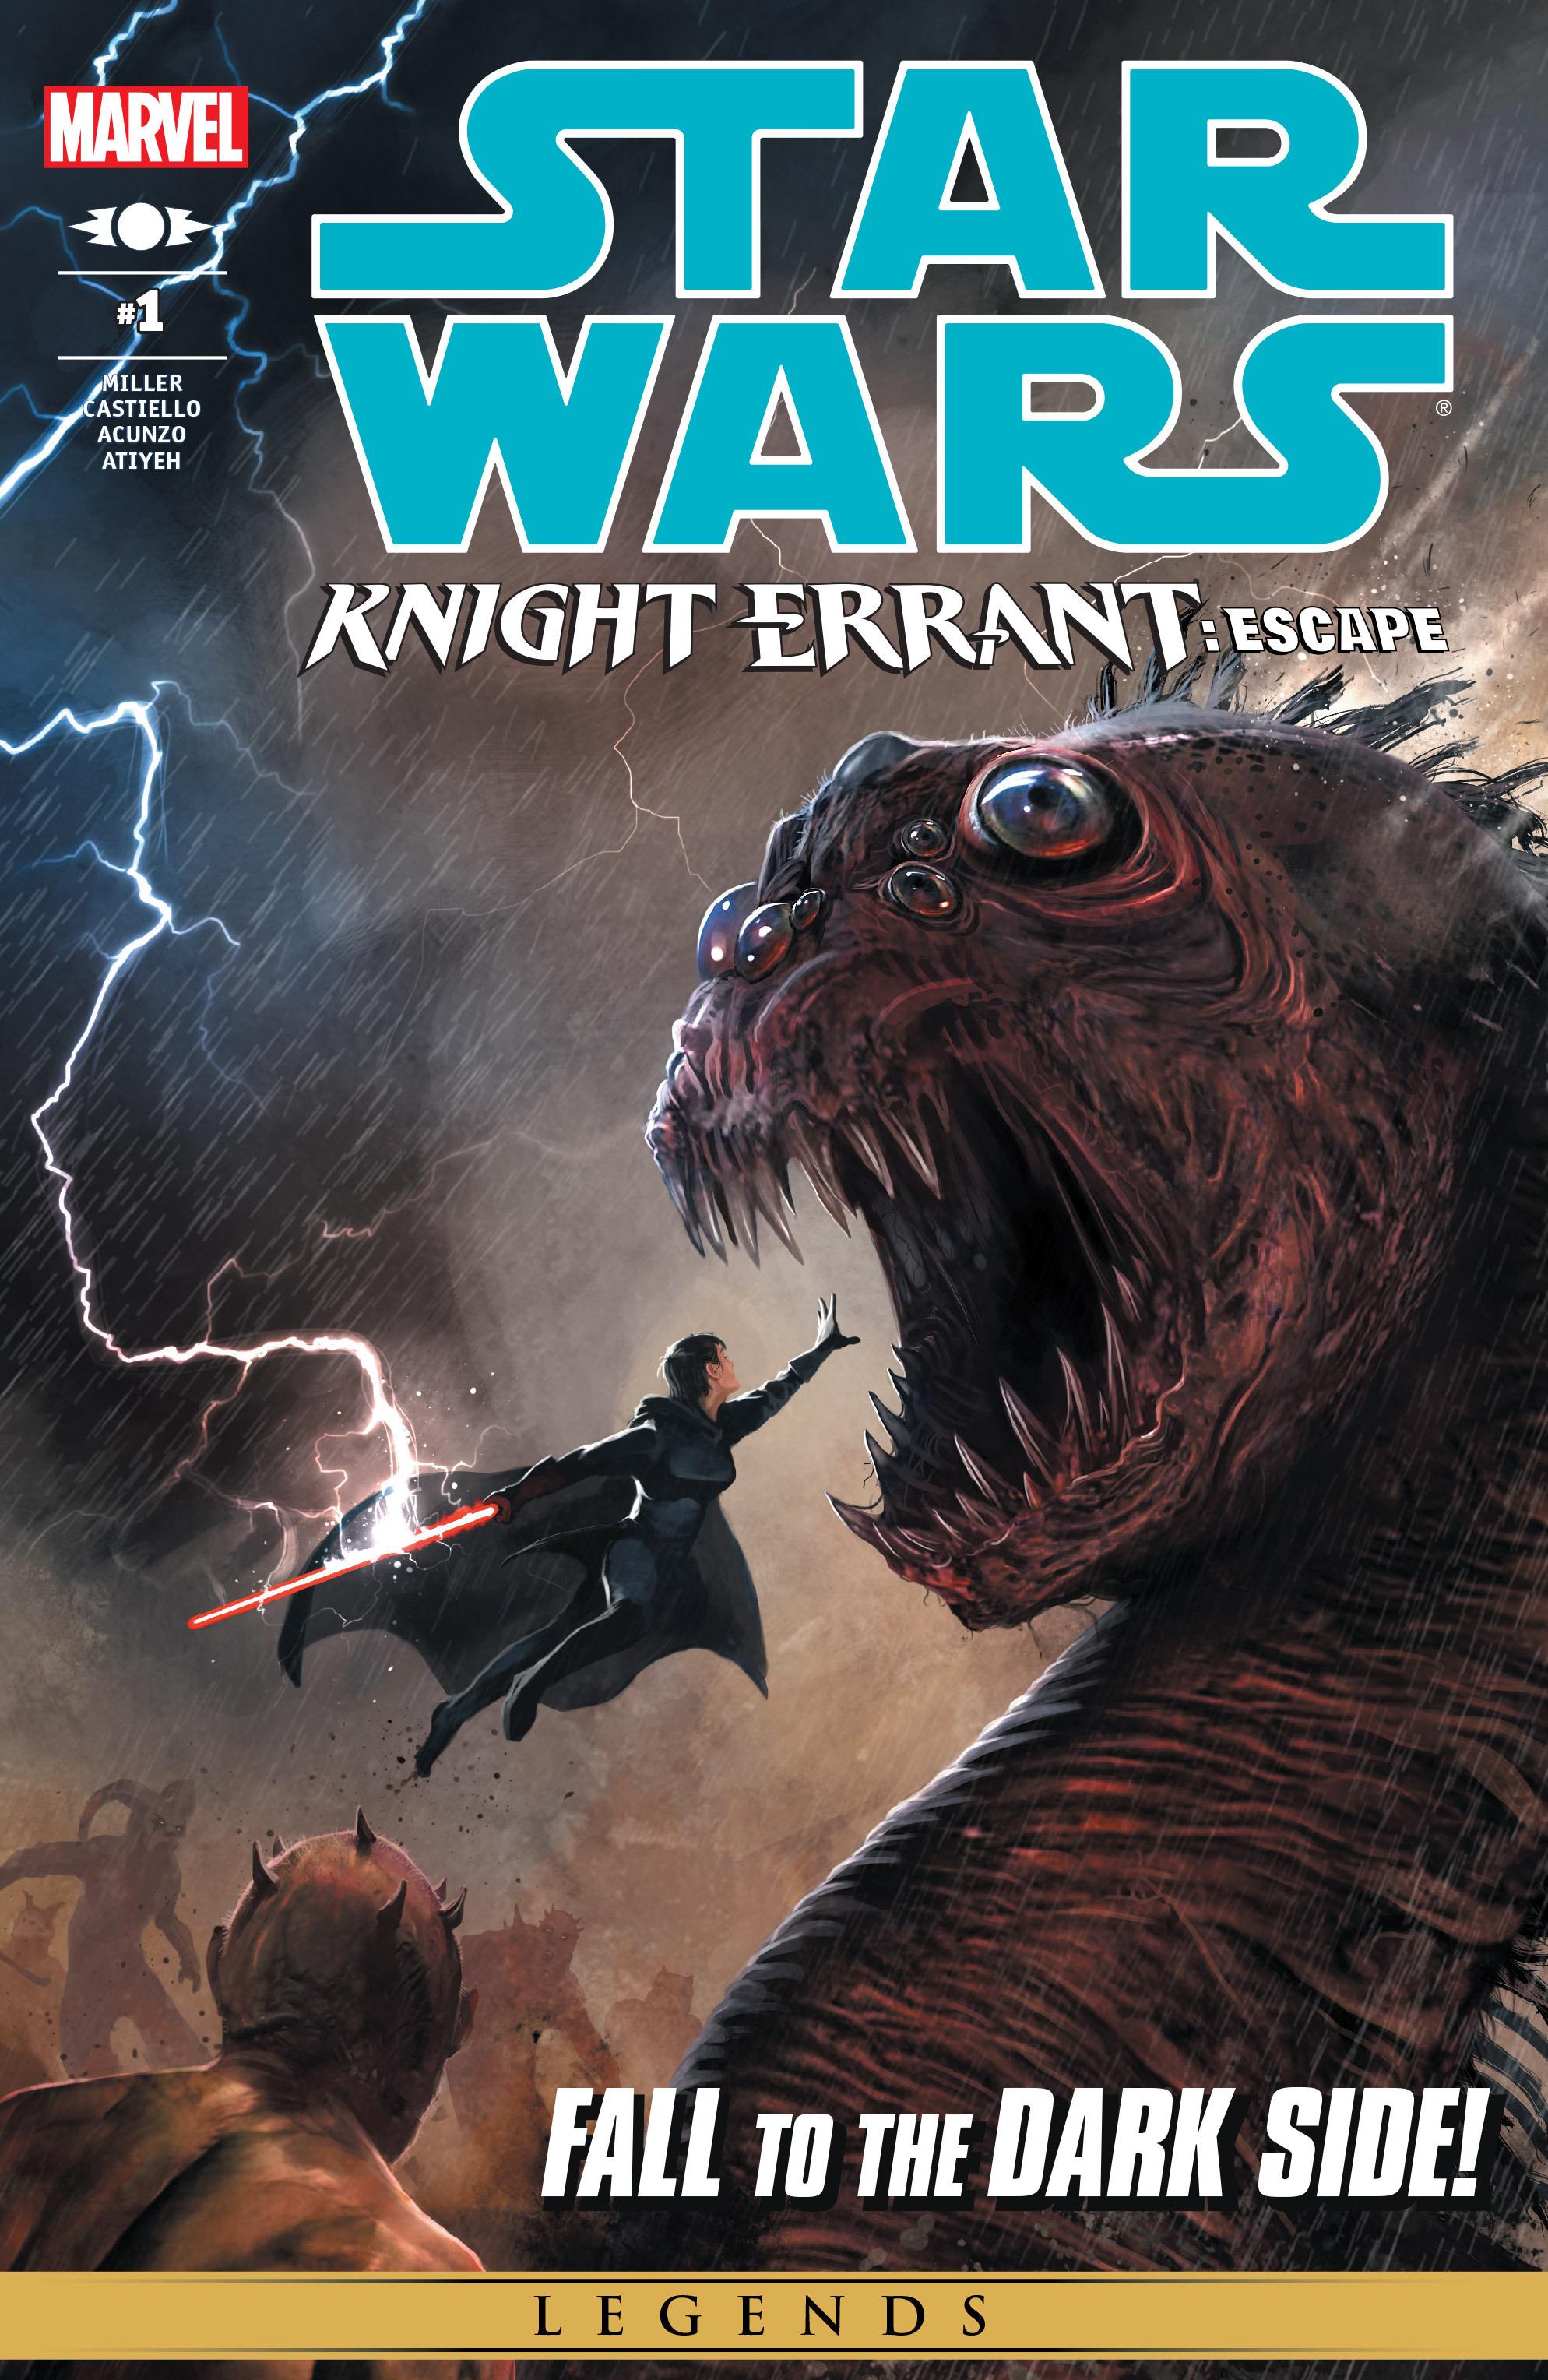 Read online Star Wars: Knight Errant - Escape comic -  Issue #1 - 1